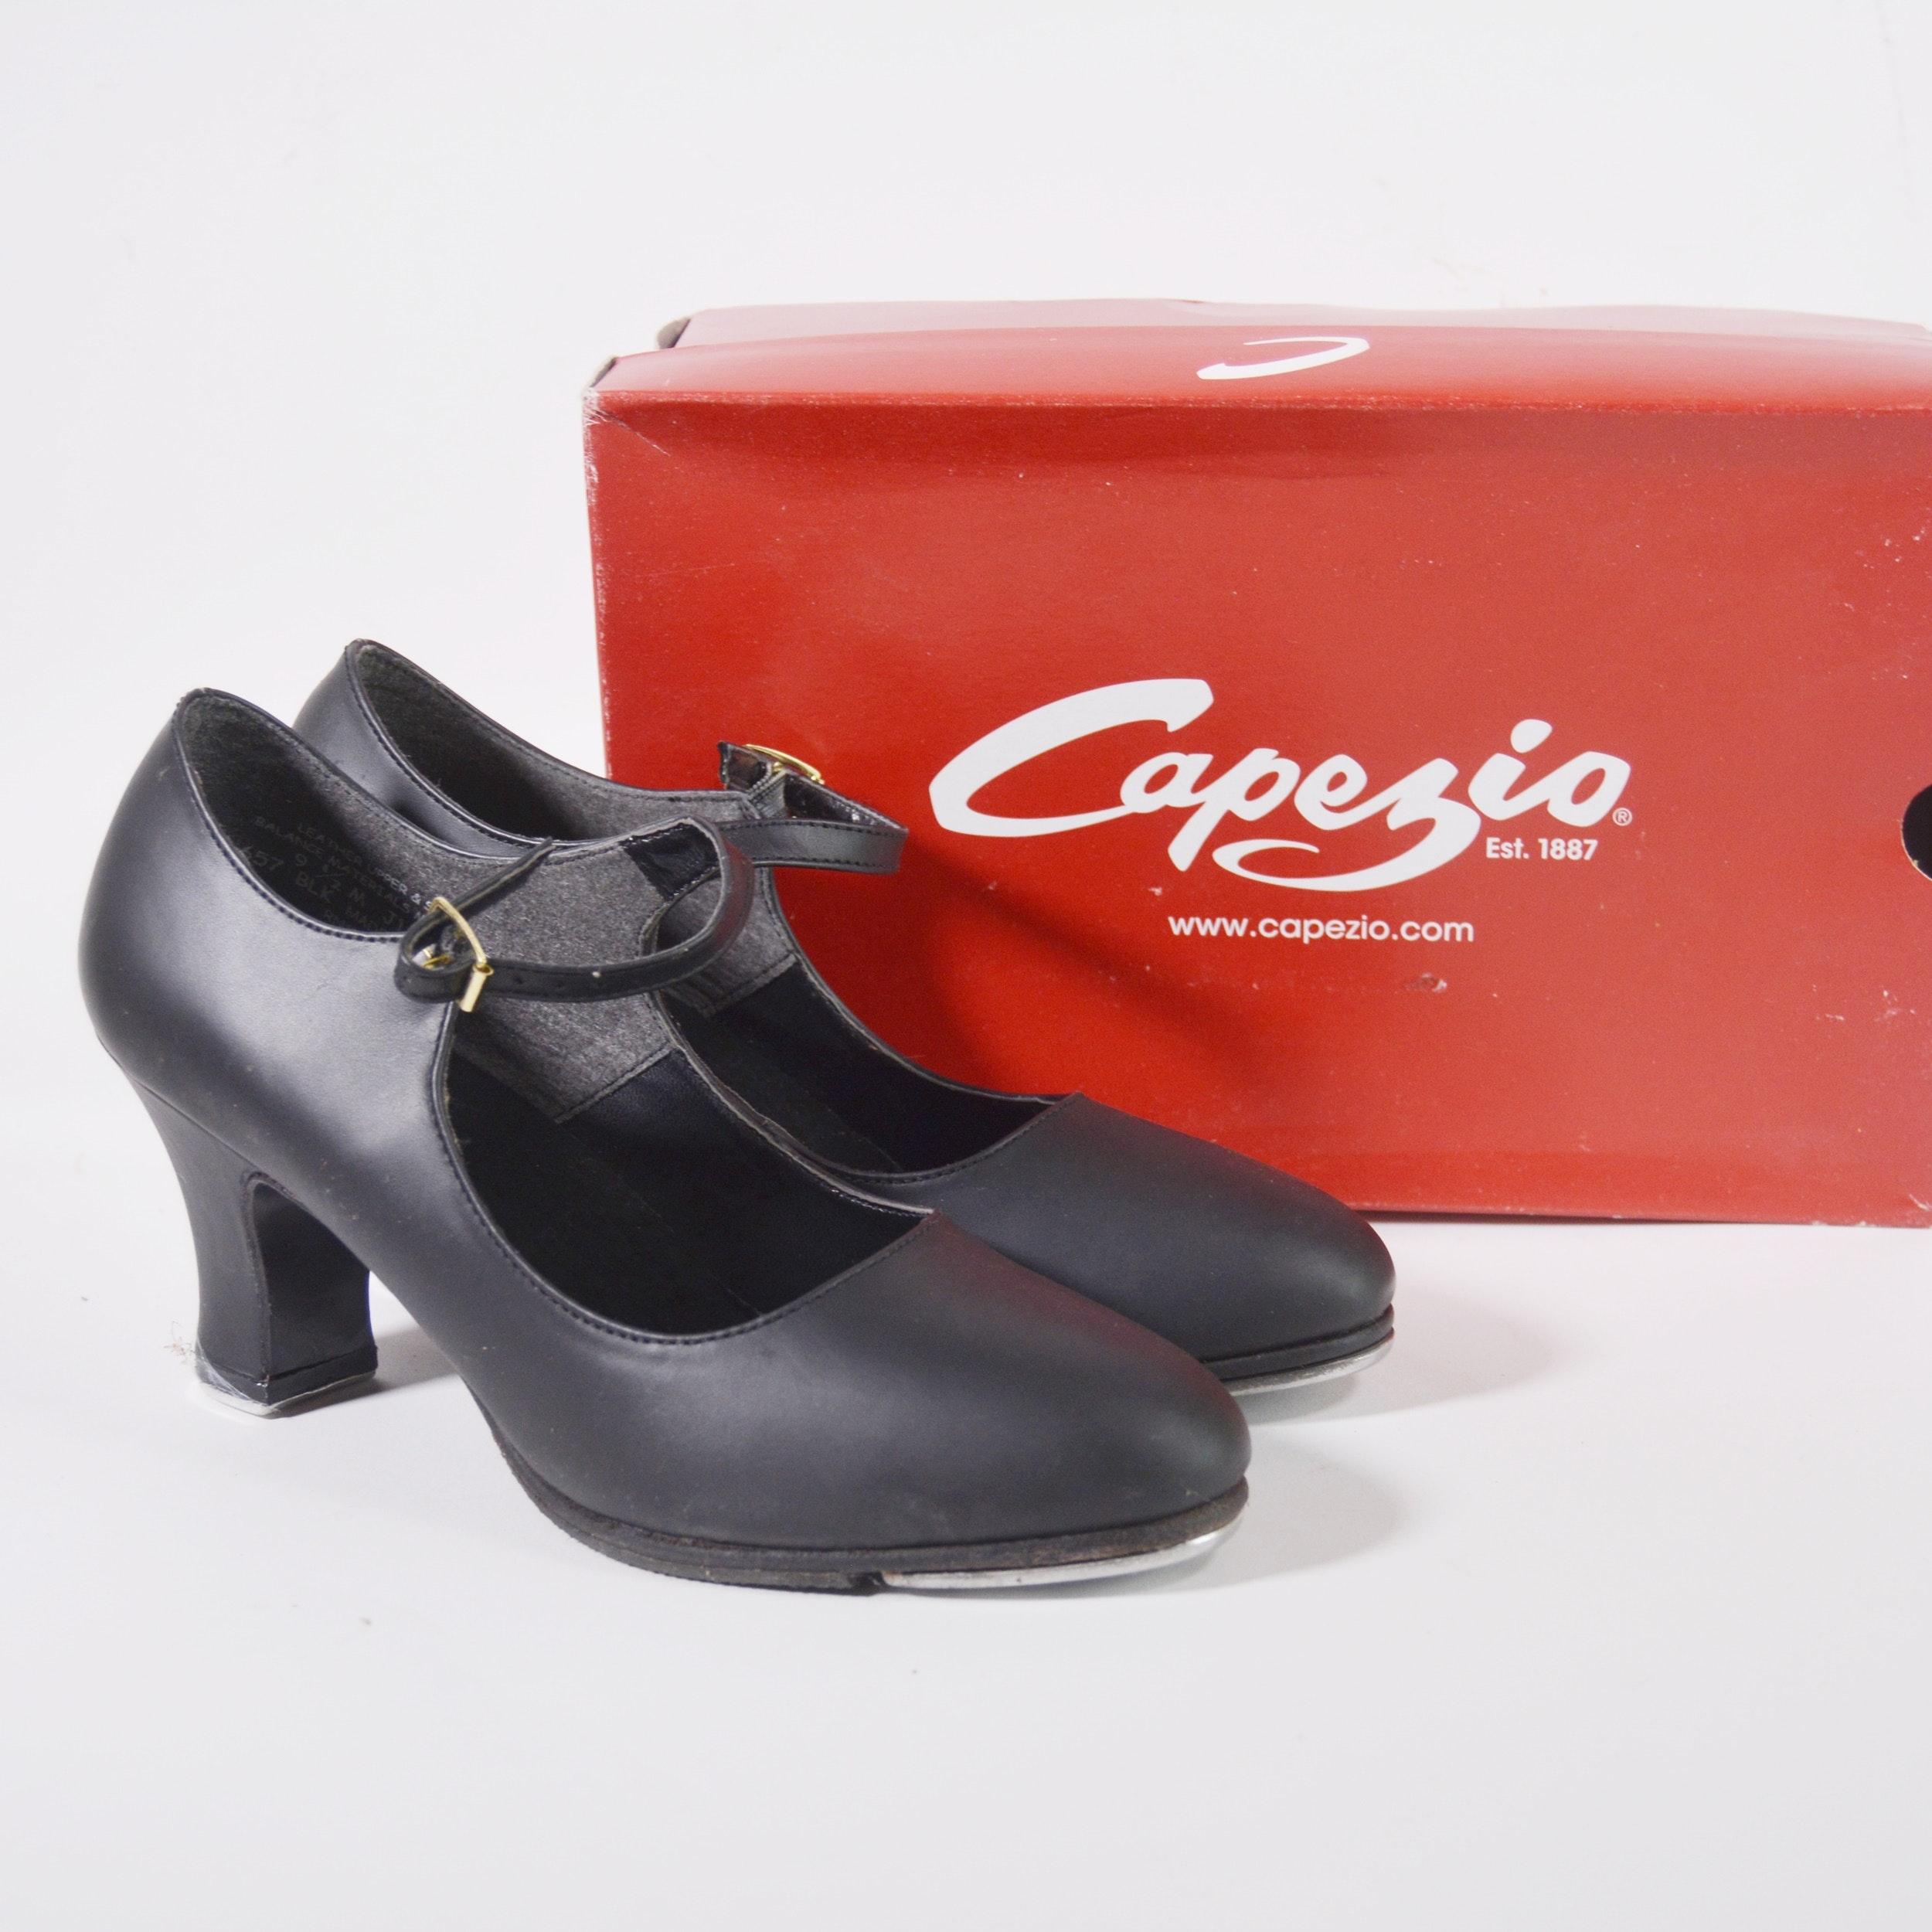 Capezio Tele Tone Tap Shoes